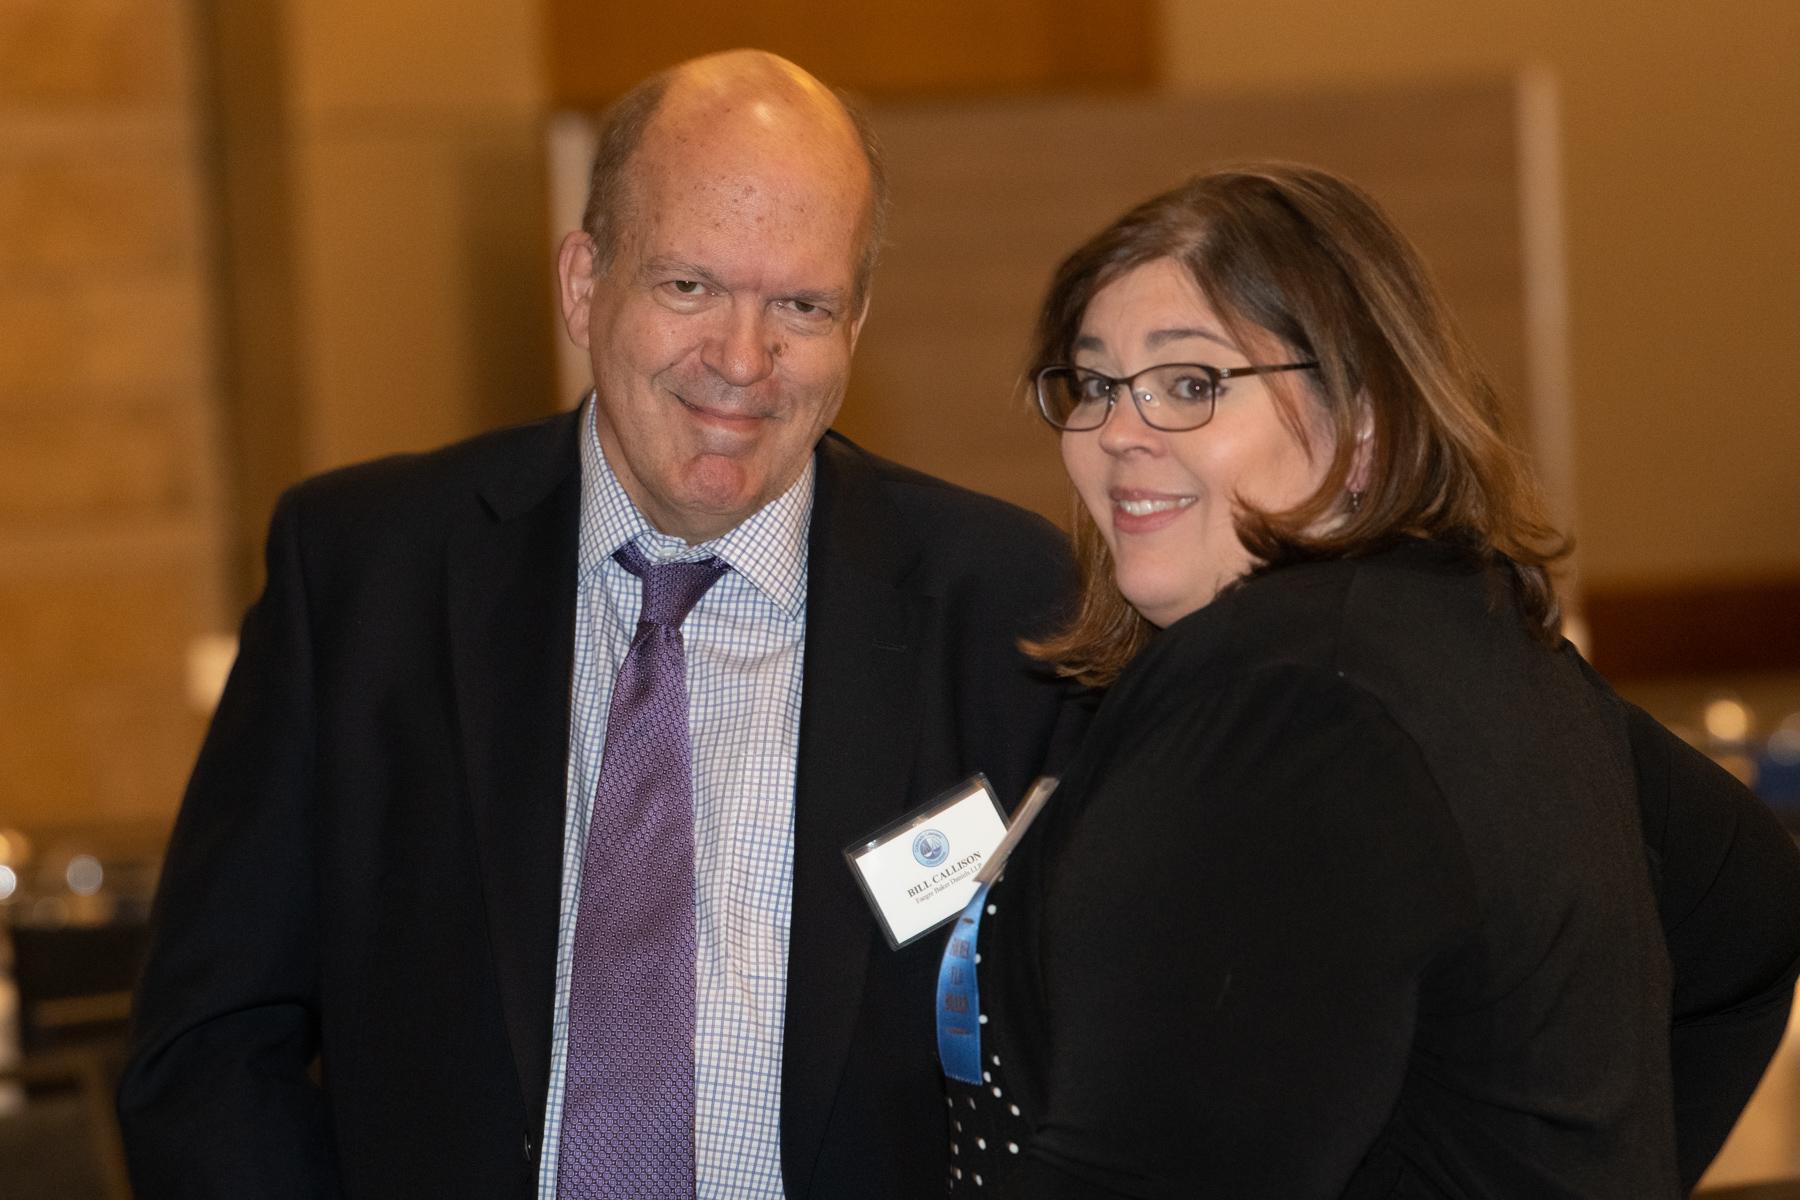 _DSC7560 Bill Callison & Marie Williams (courtesy of Hartmannphoto).jpg